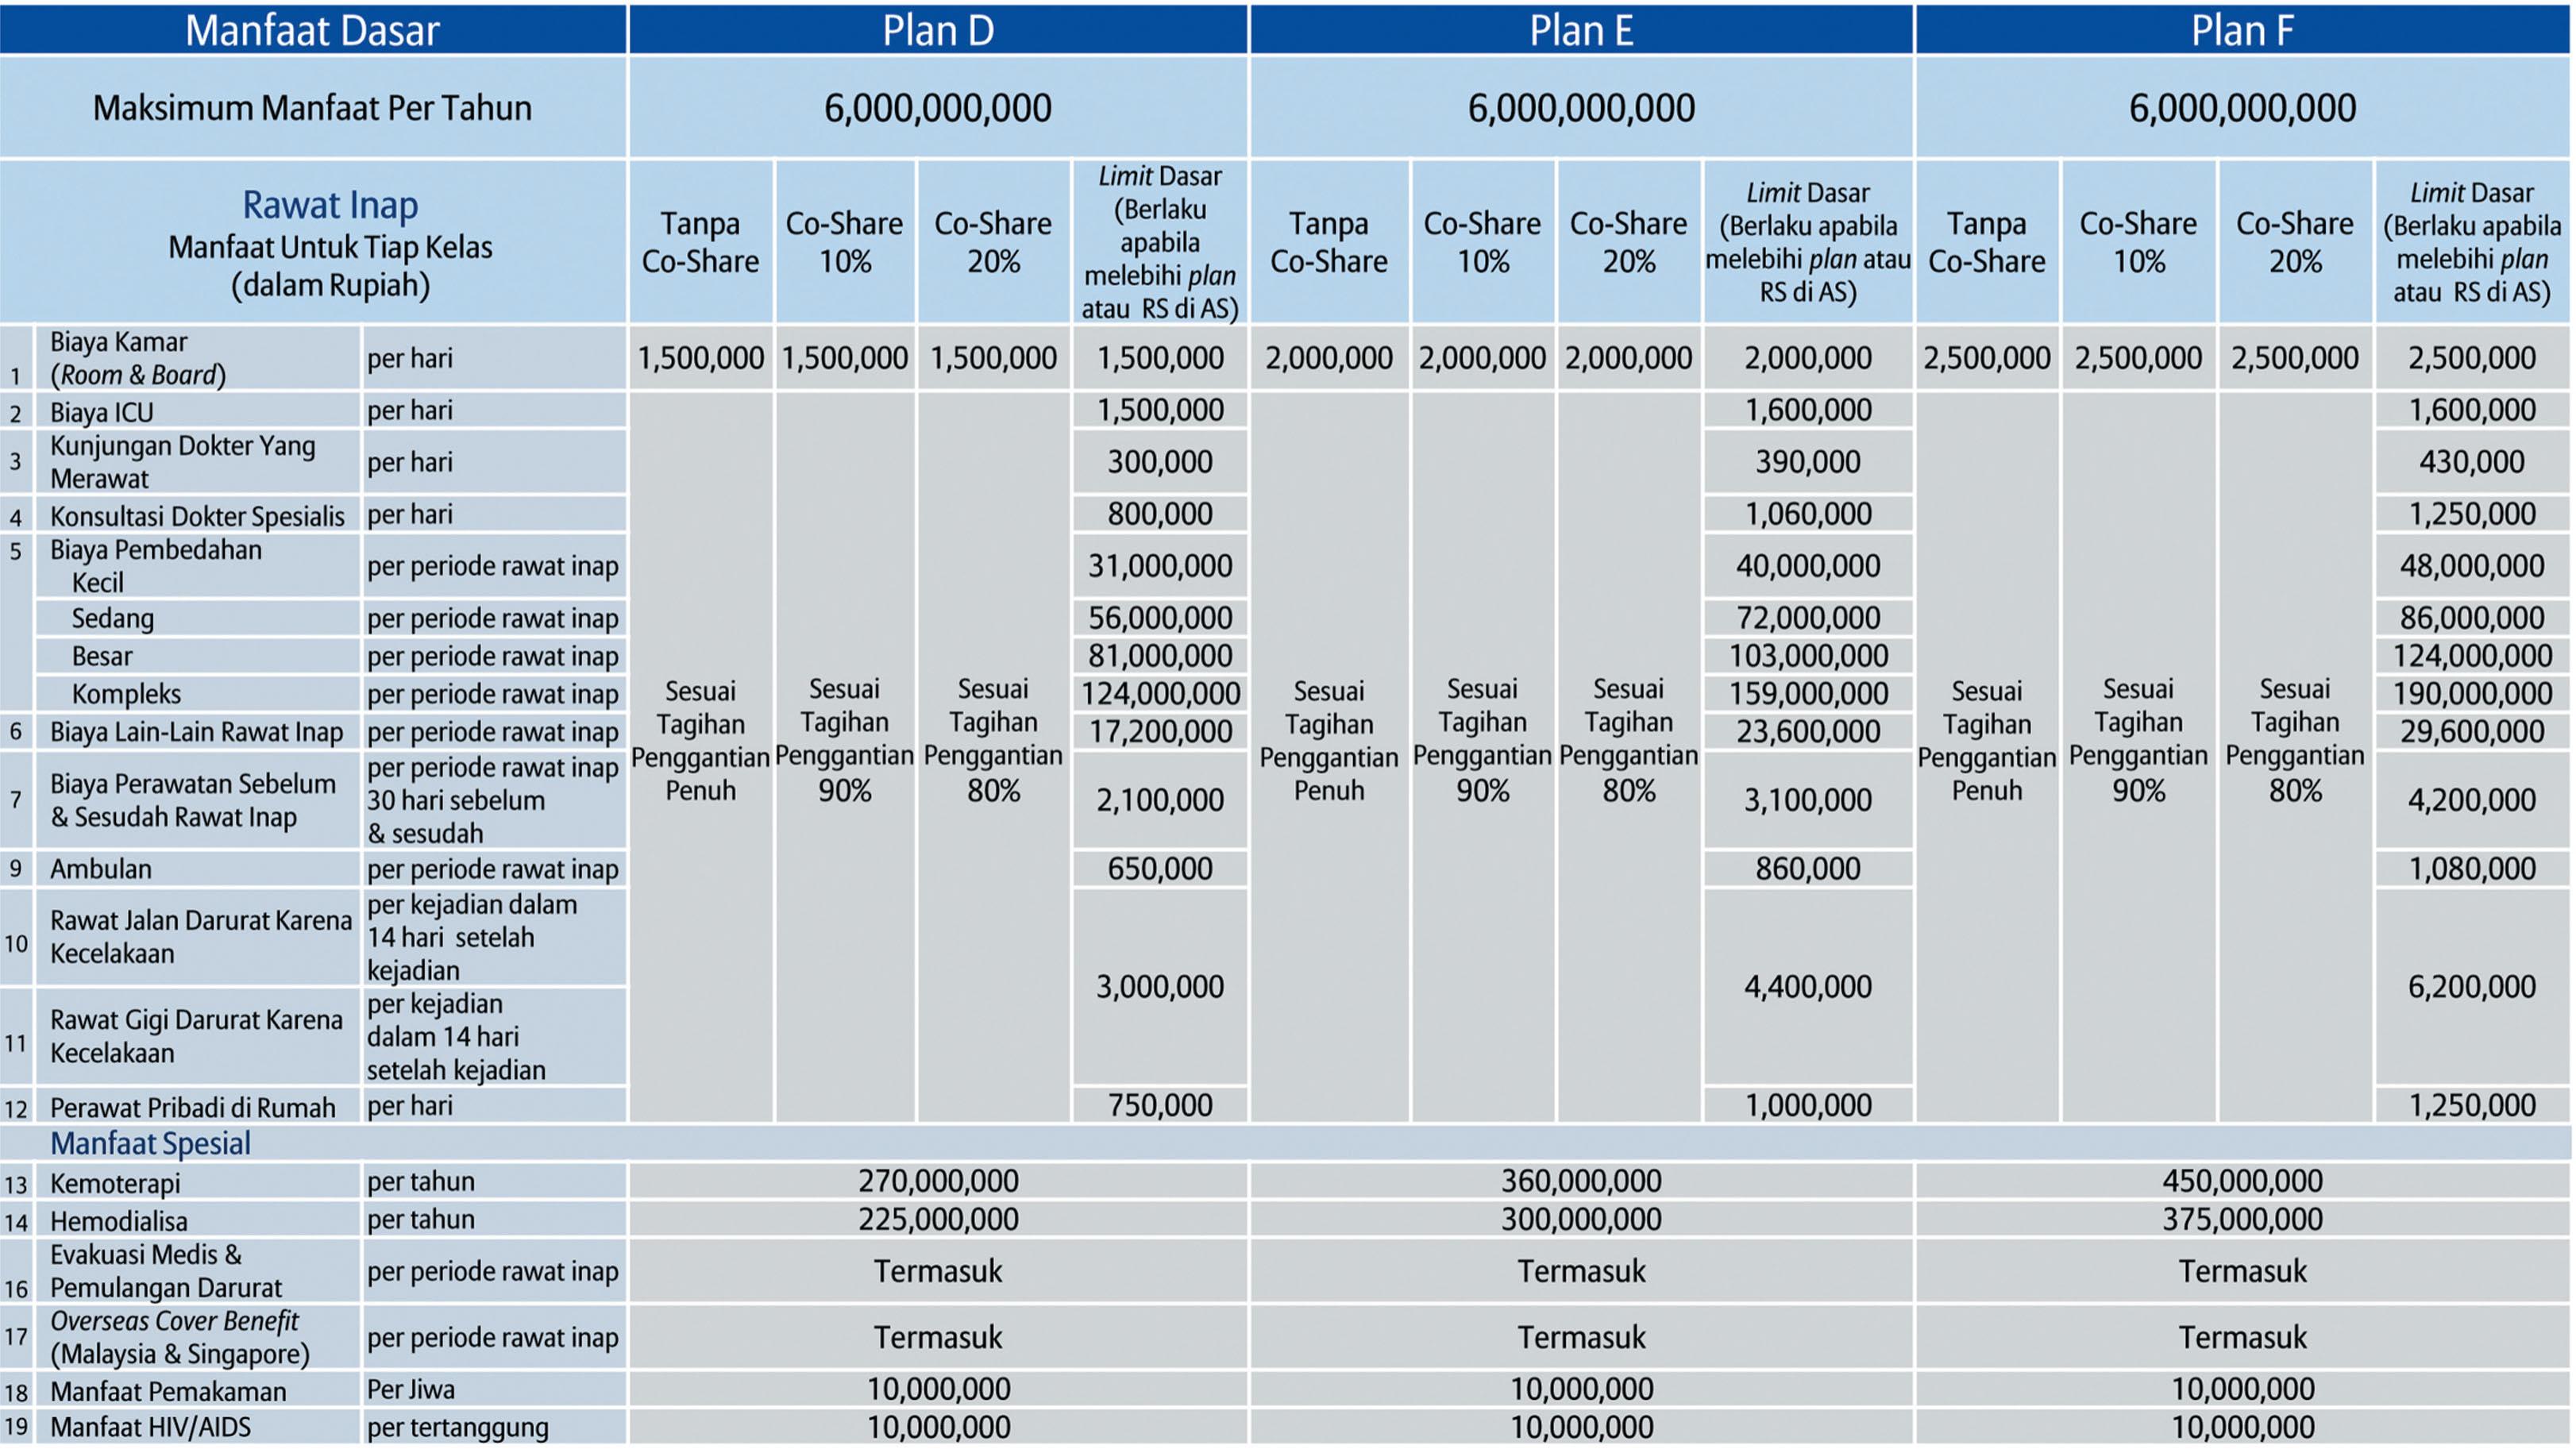 tabel manfaat smartmed premier 2